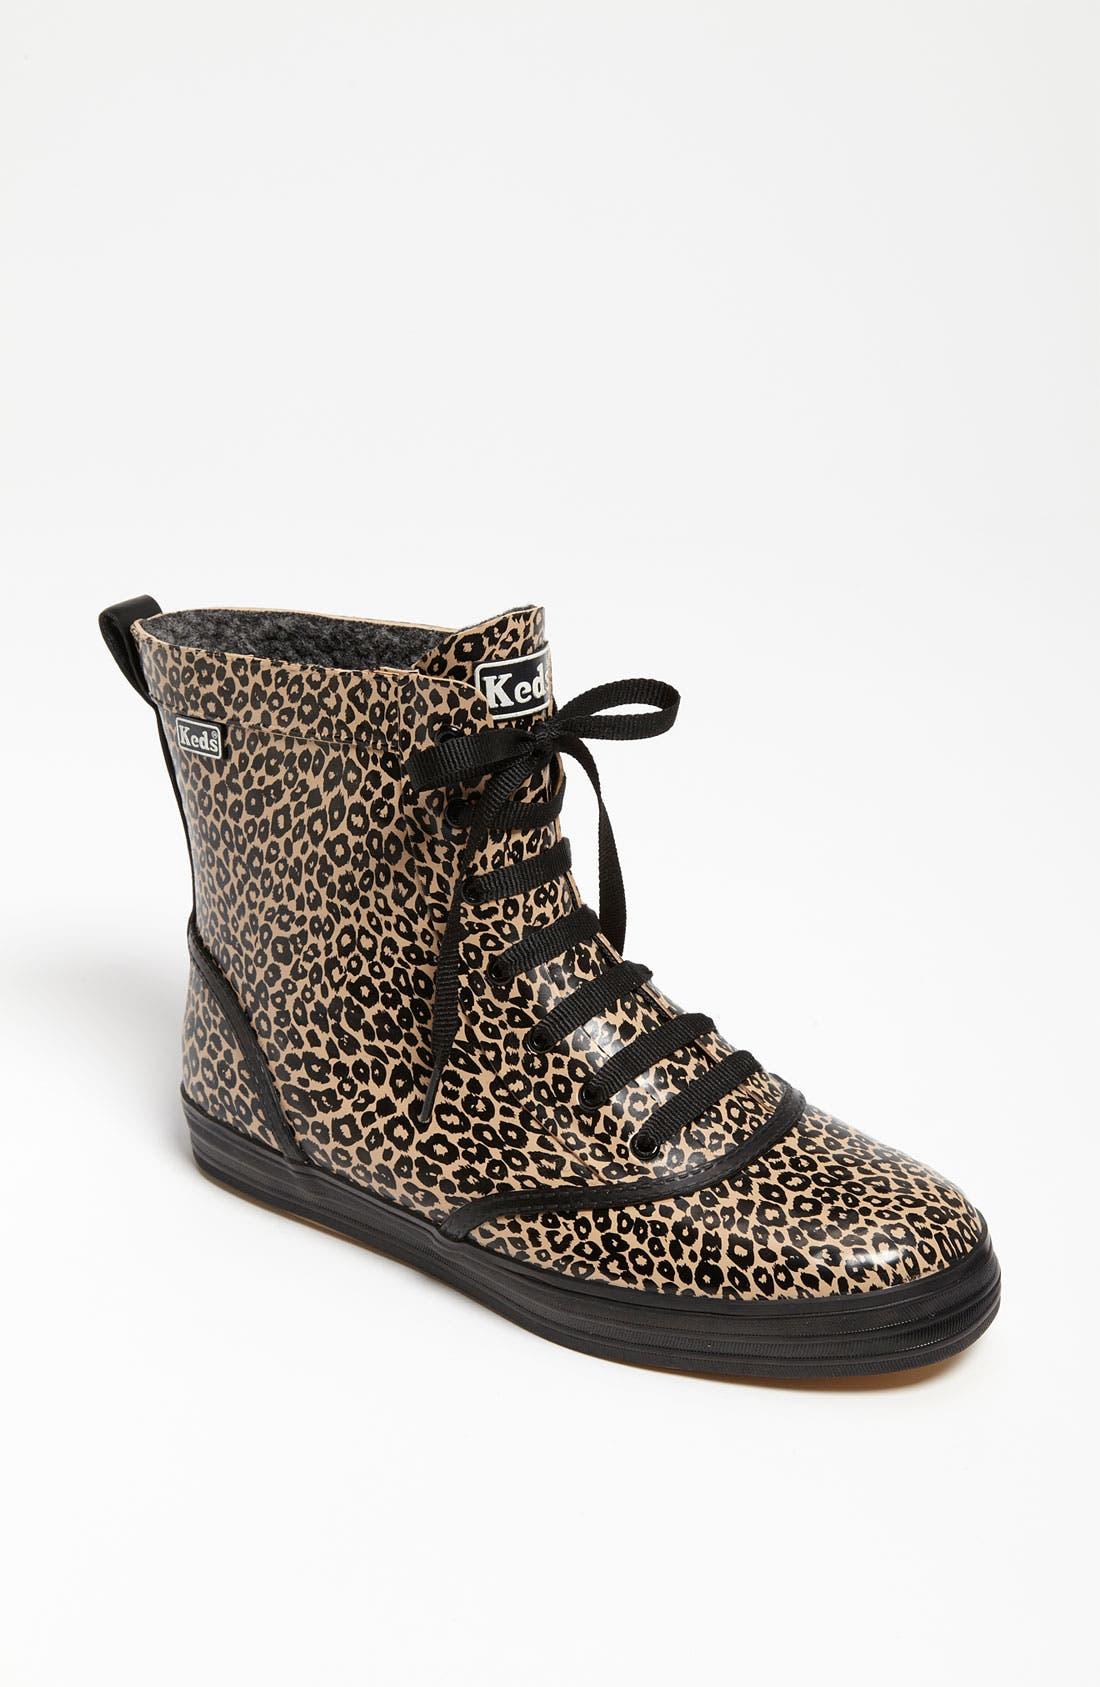 Main Image - Keds® 'Champion Puddle Jumper' Boot